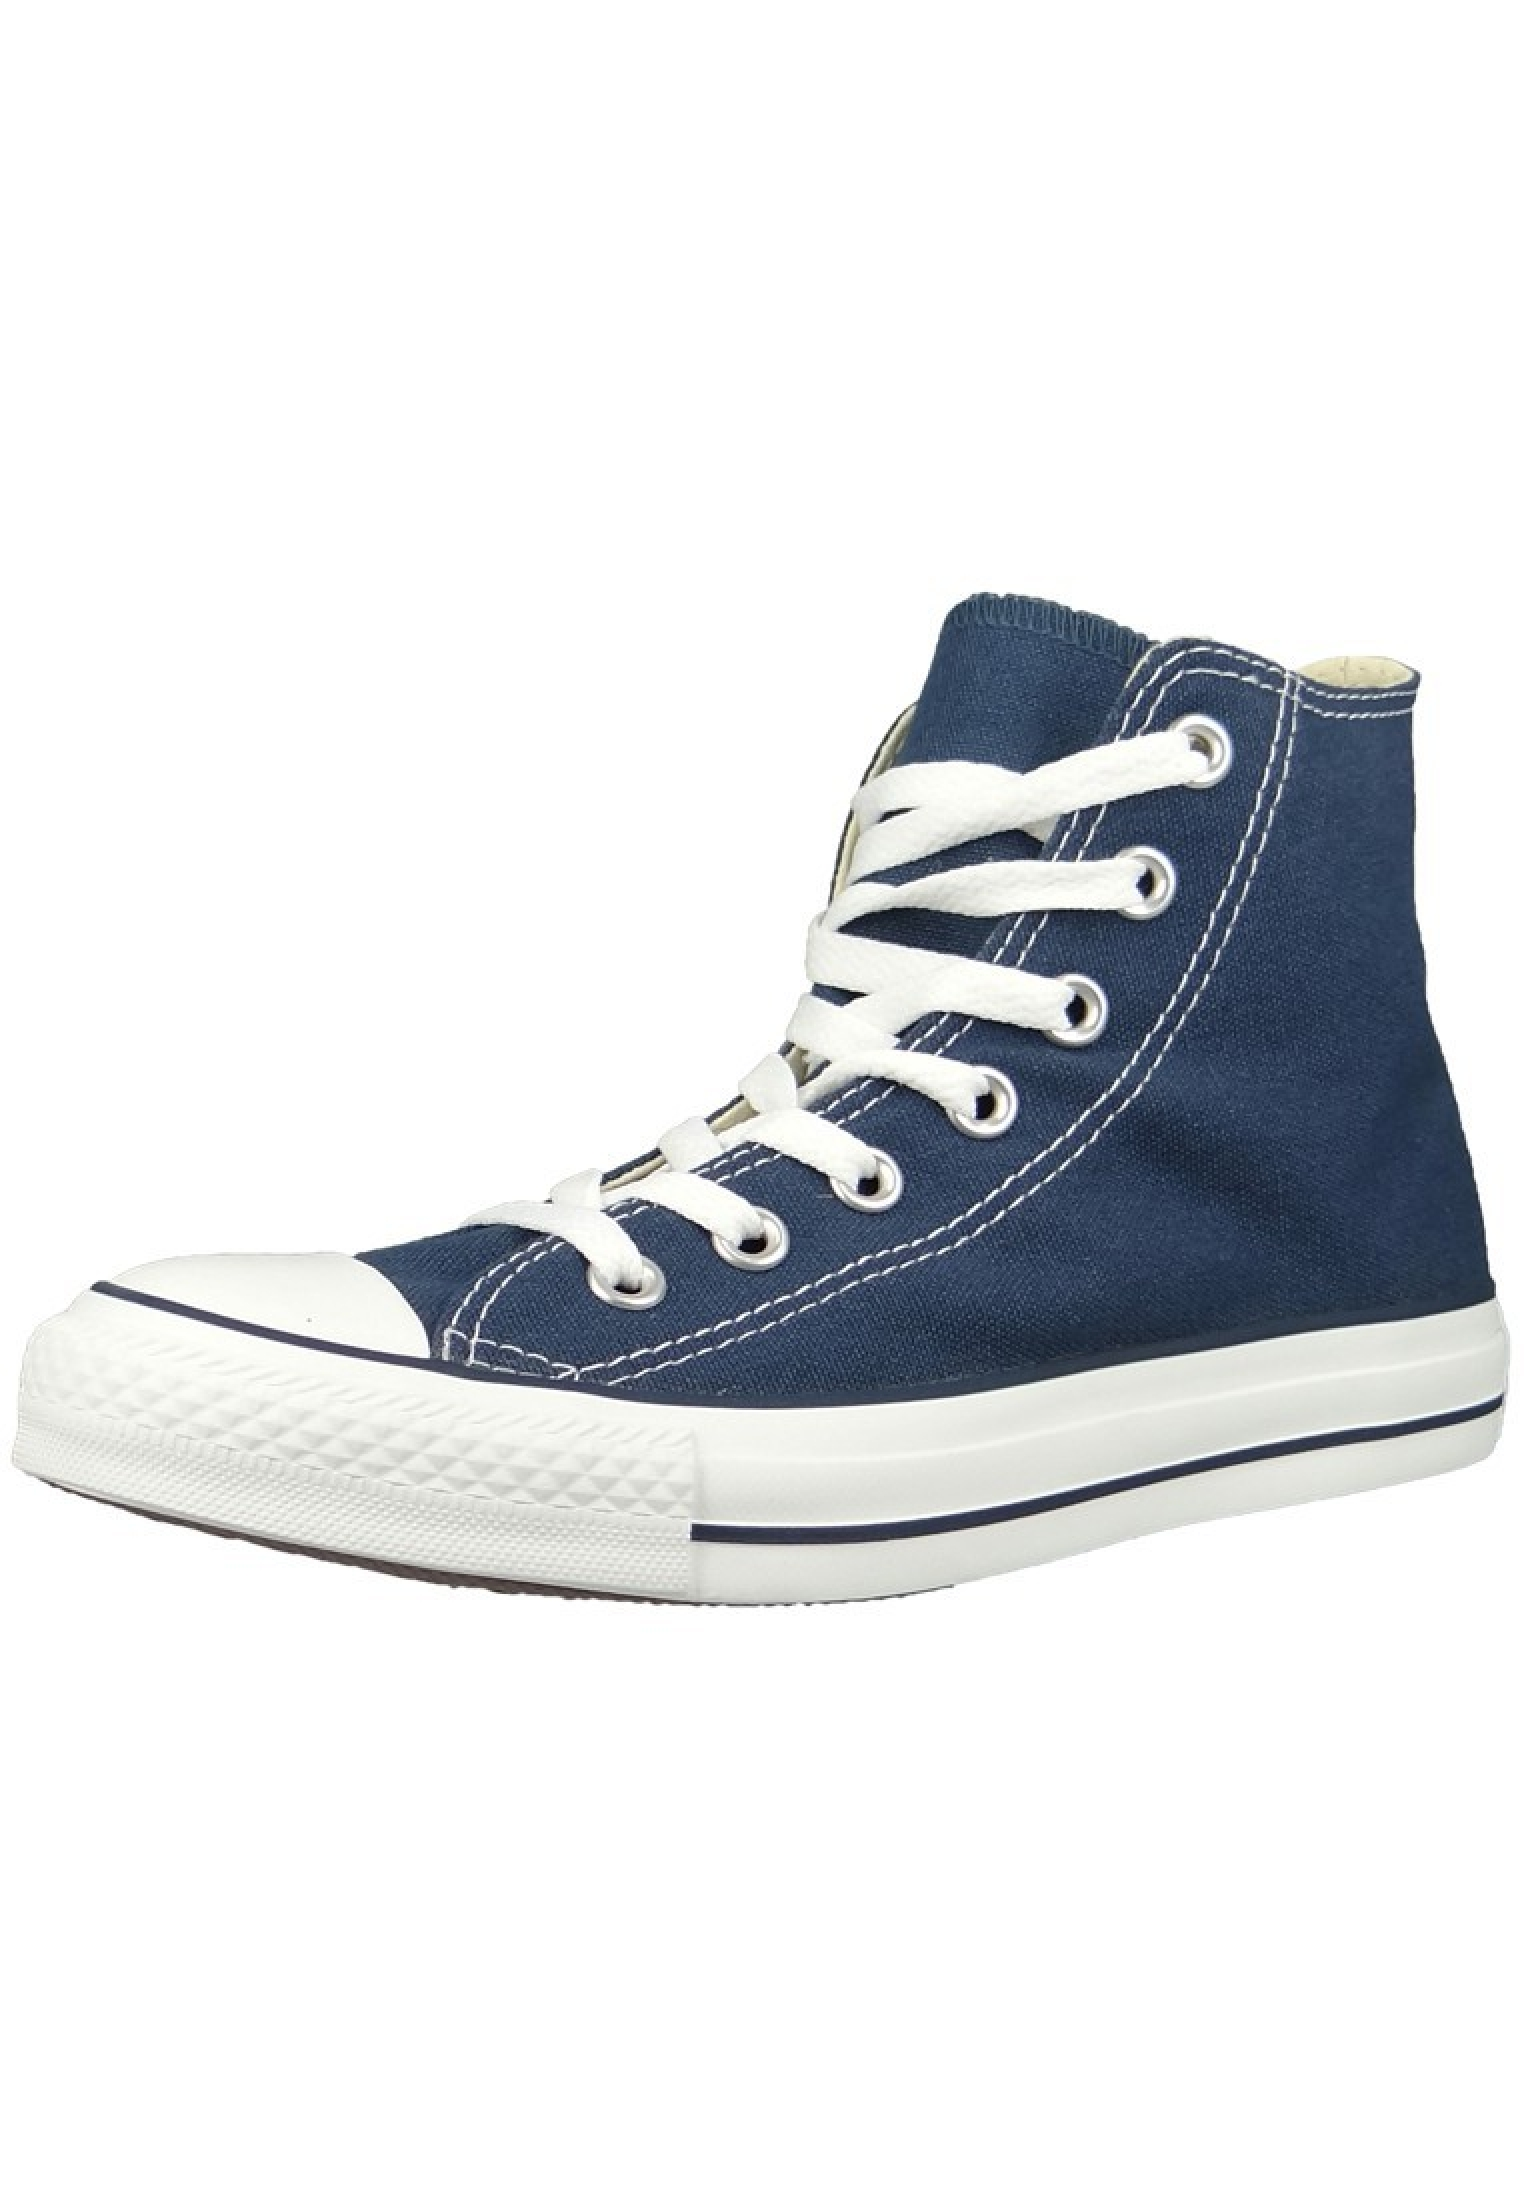 converse chucks blau m9622 navy chuck taylor all star sp hi herrenschuhe sneaker sneaker high. Black Bedroom Furniture Sets. Home Design Ideas